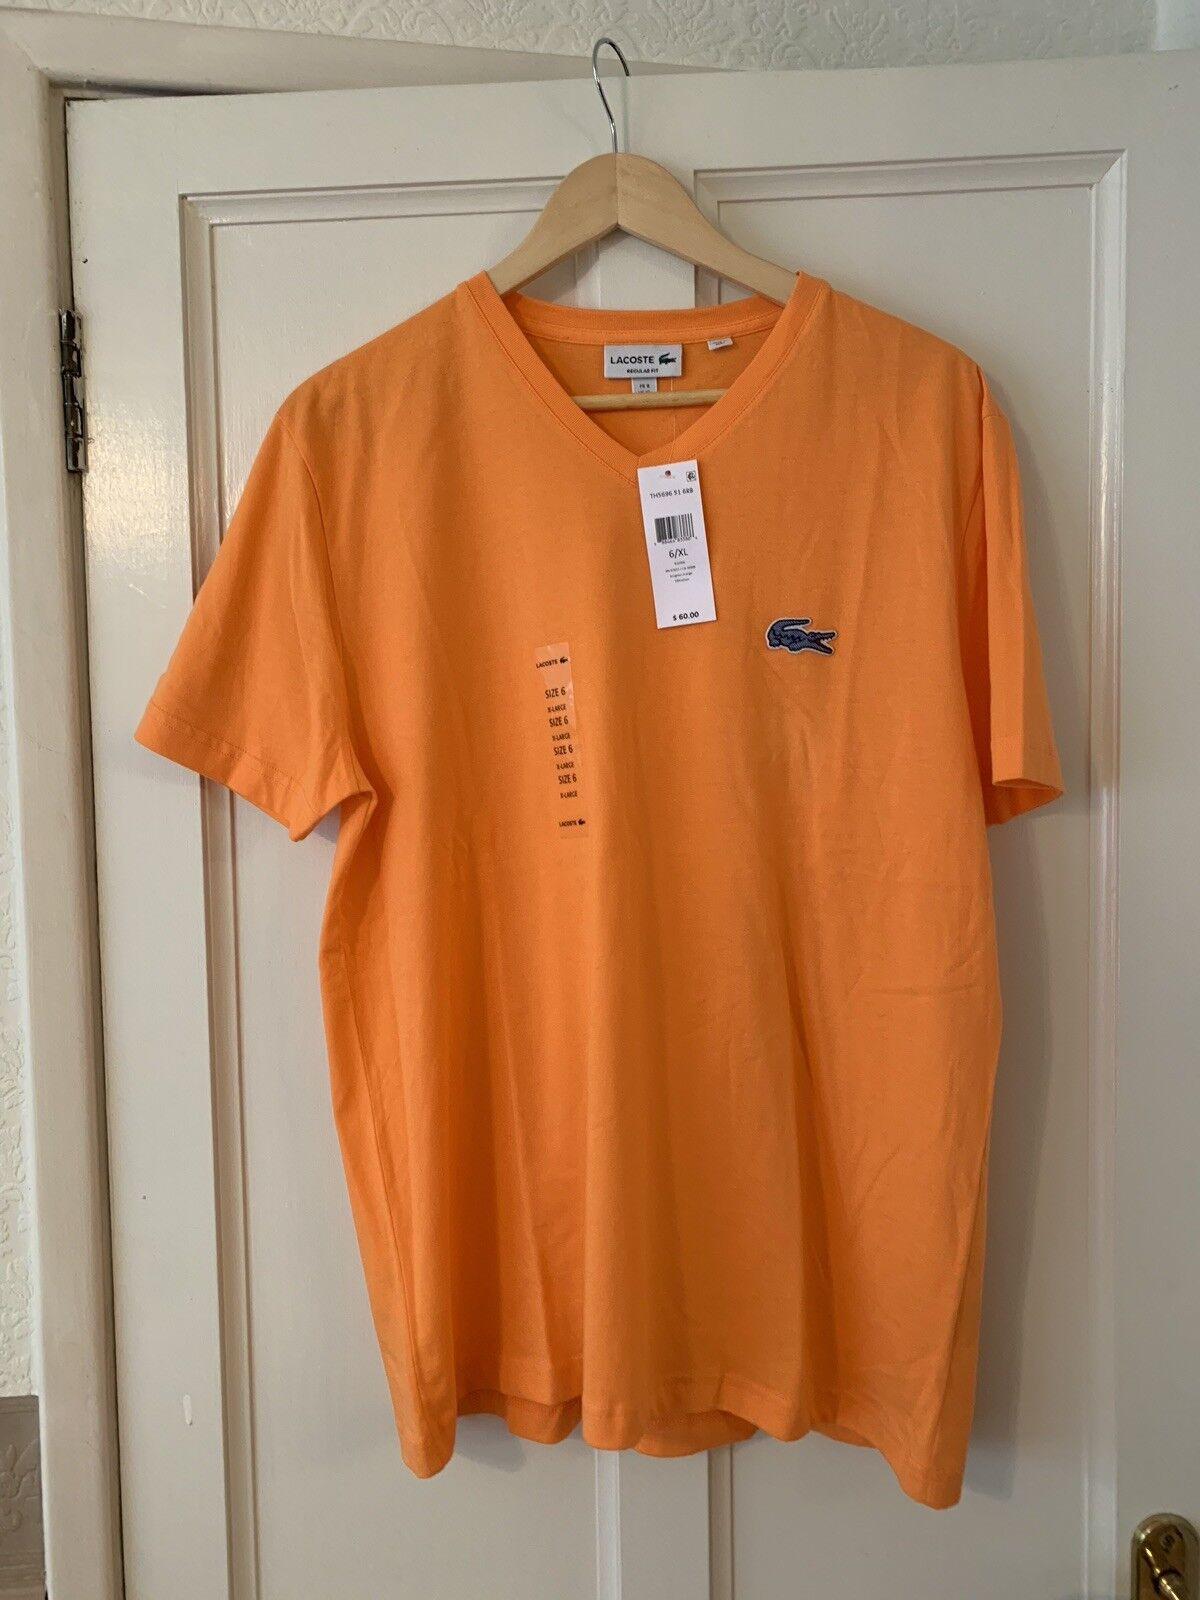 2684226ef2db BNWT Lacoste regular fit T orange. Size 6 XL Mens Shirt nidwno2312-T-Shirts